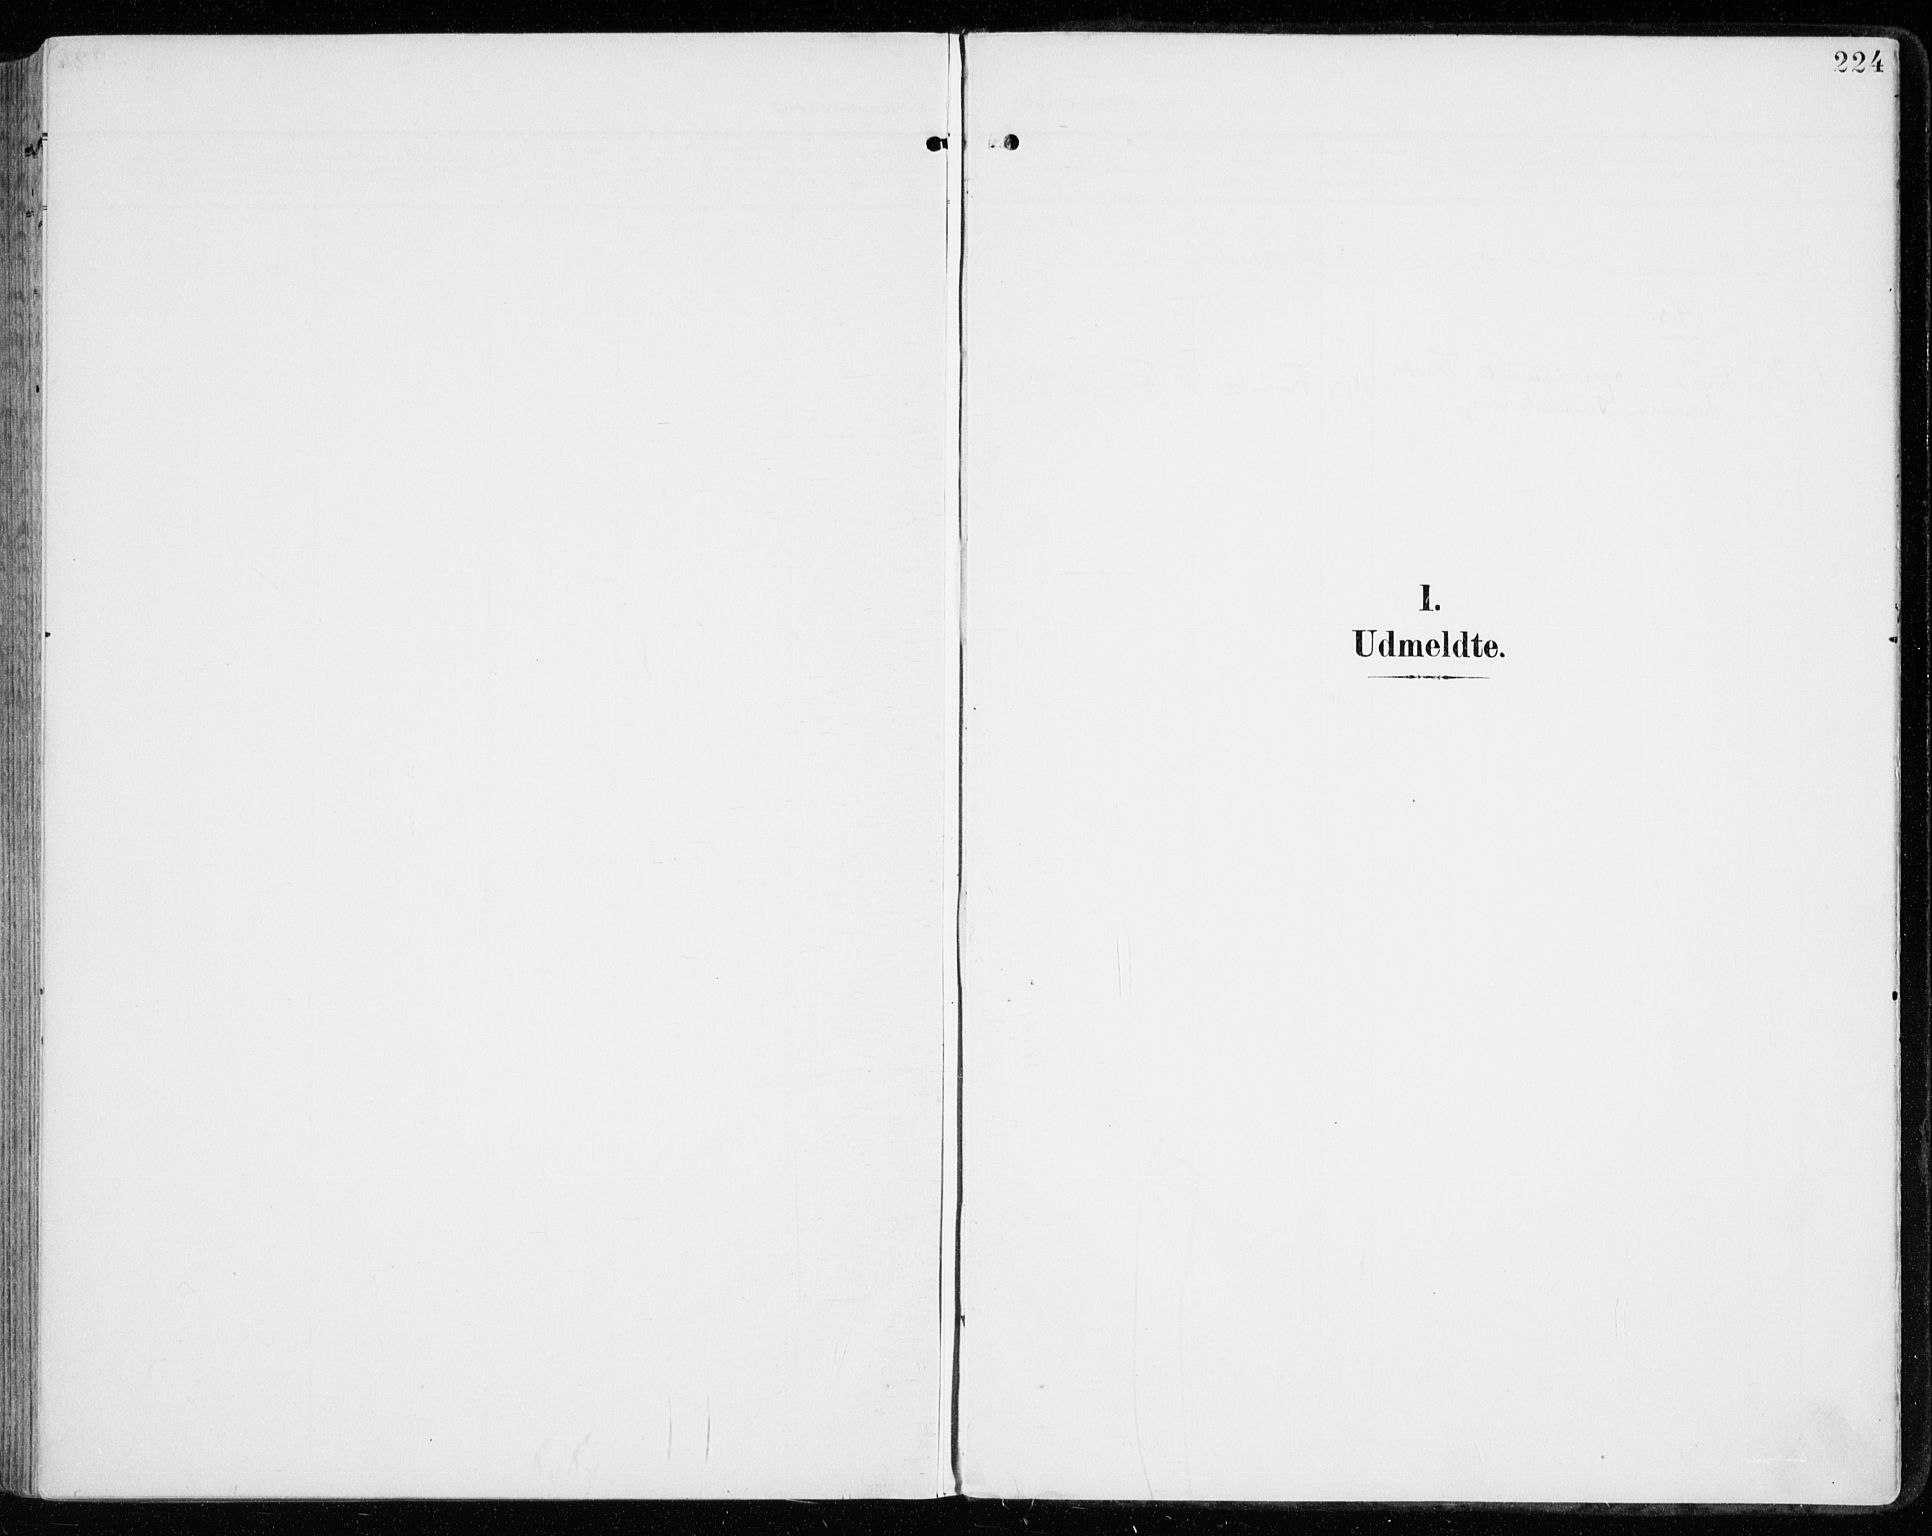 SAH, Vardal prestekontor, H/Ha/Haa/L0016: Ministerialbok nr. 16, 1904-1916, s. 224